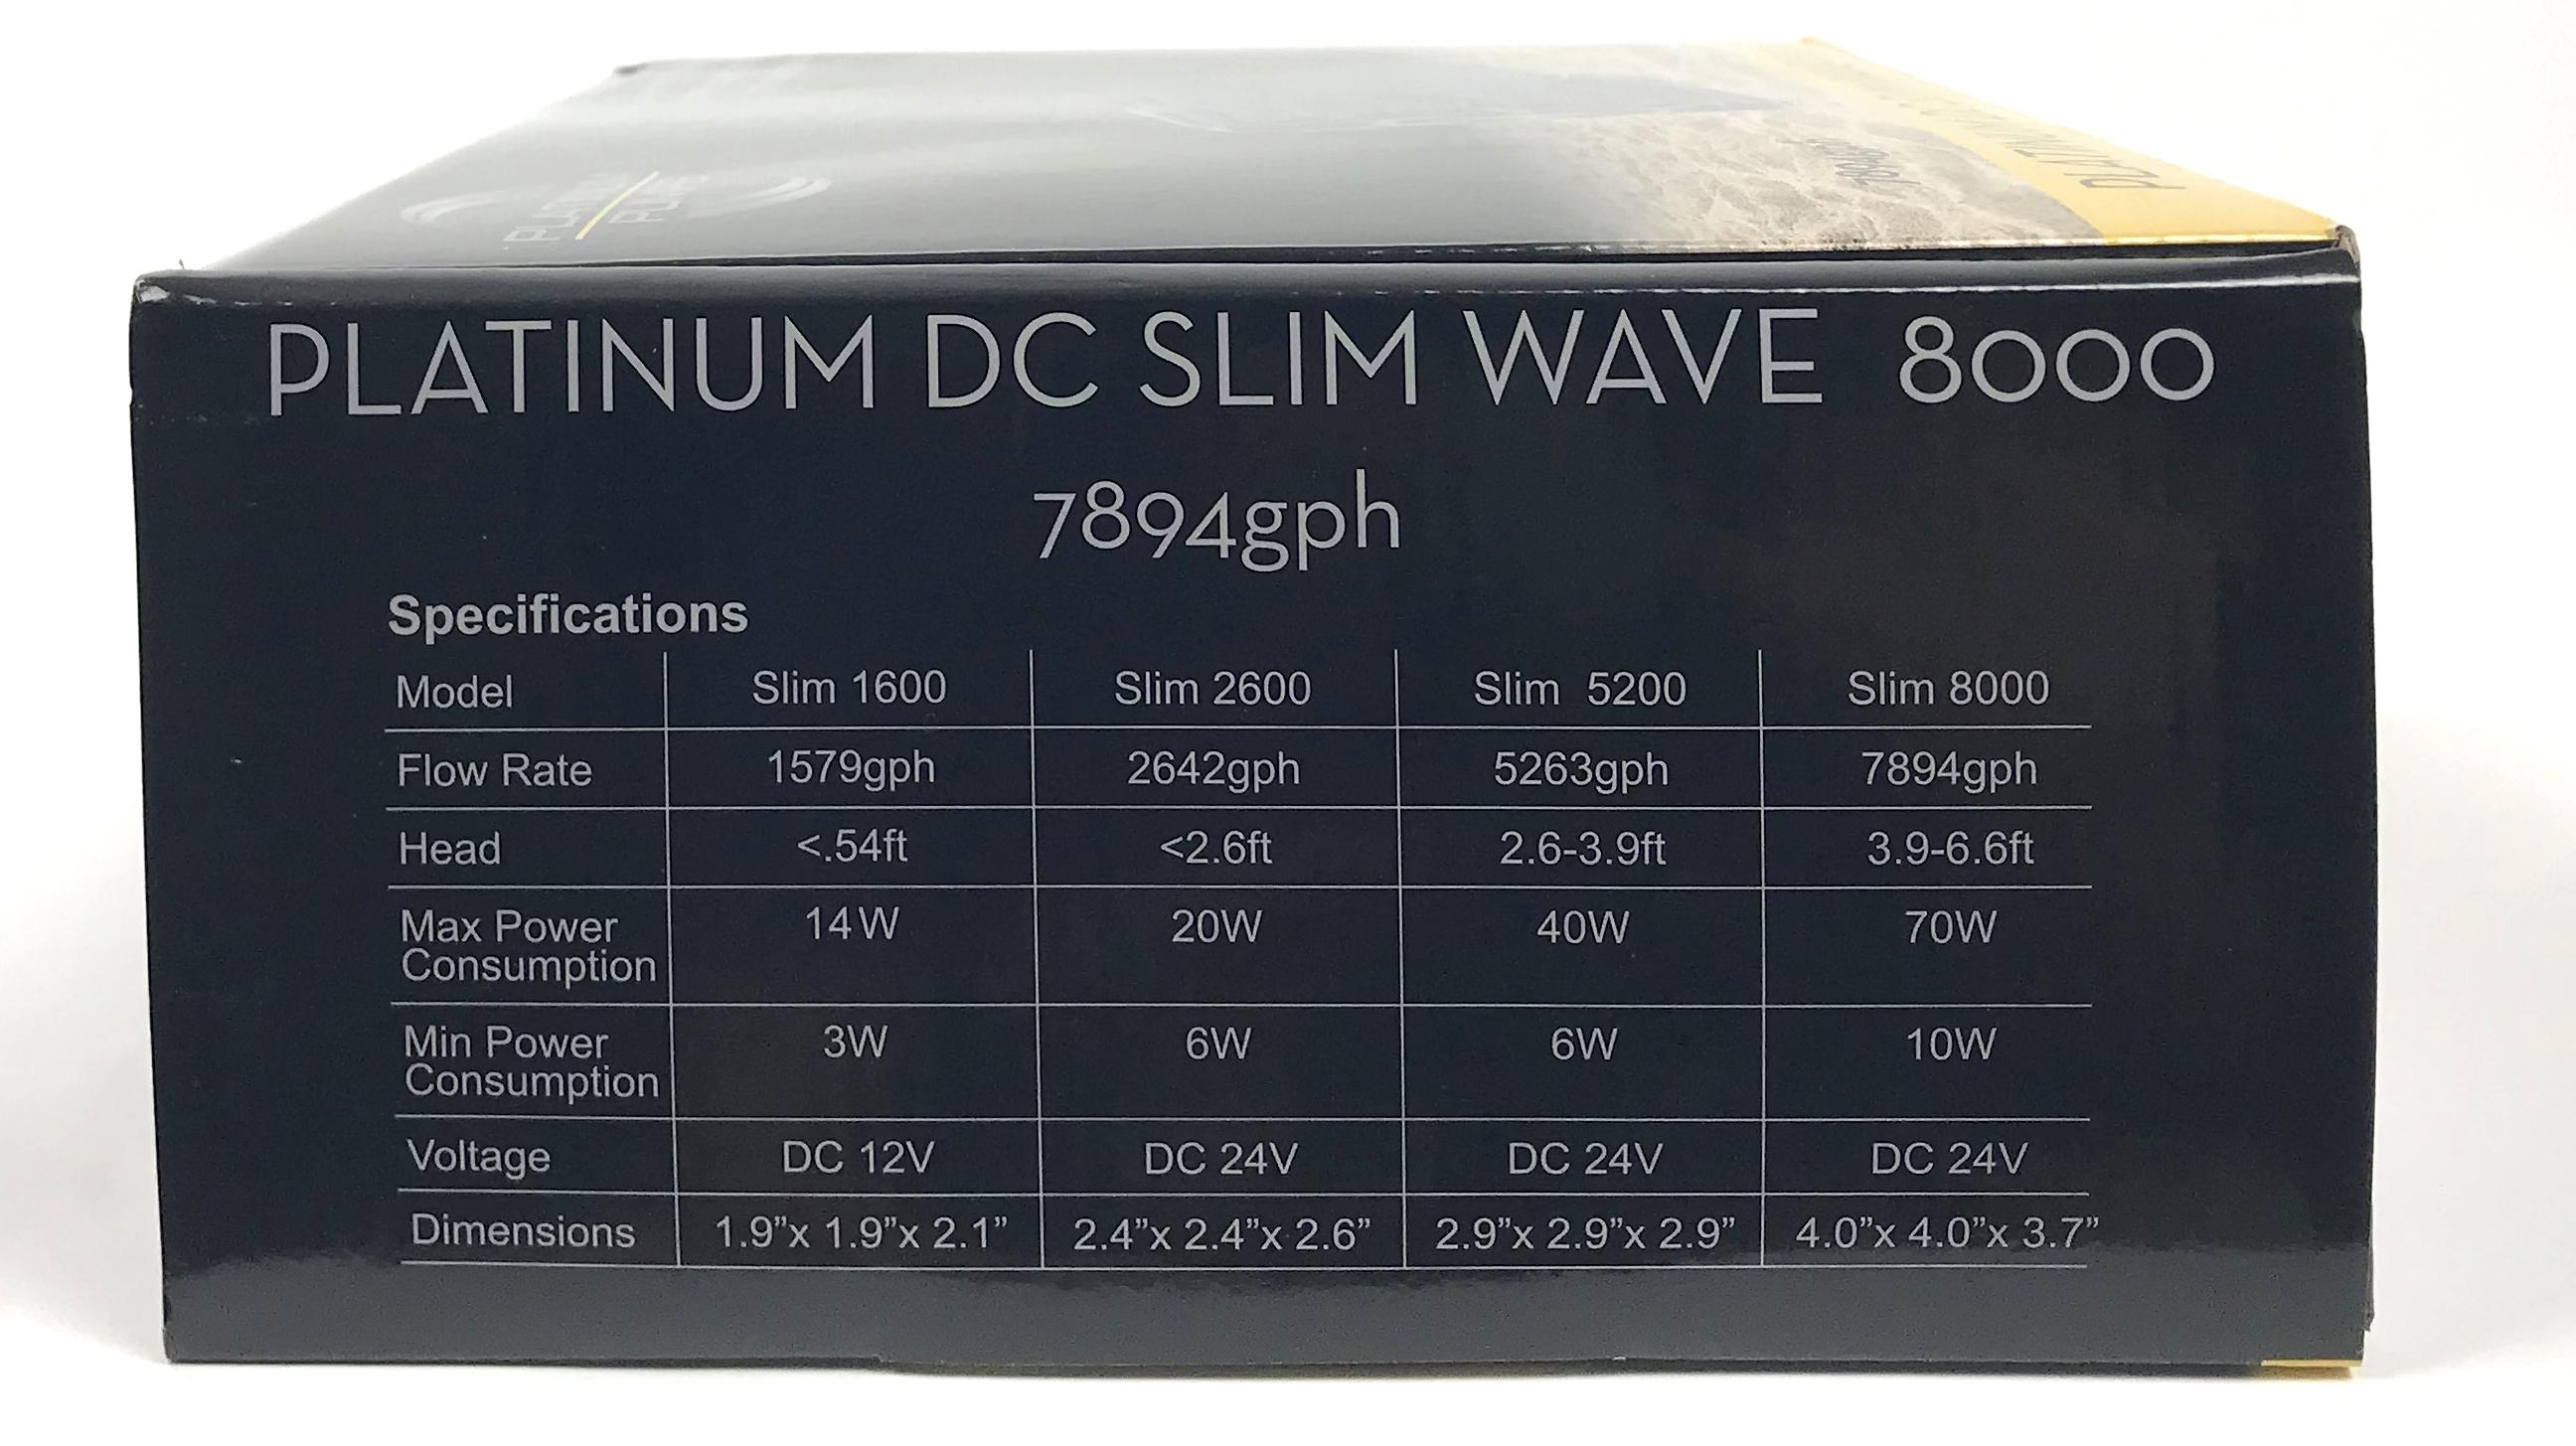 Platinum DC Slim Wave 8000 Pump - 7894 gph